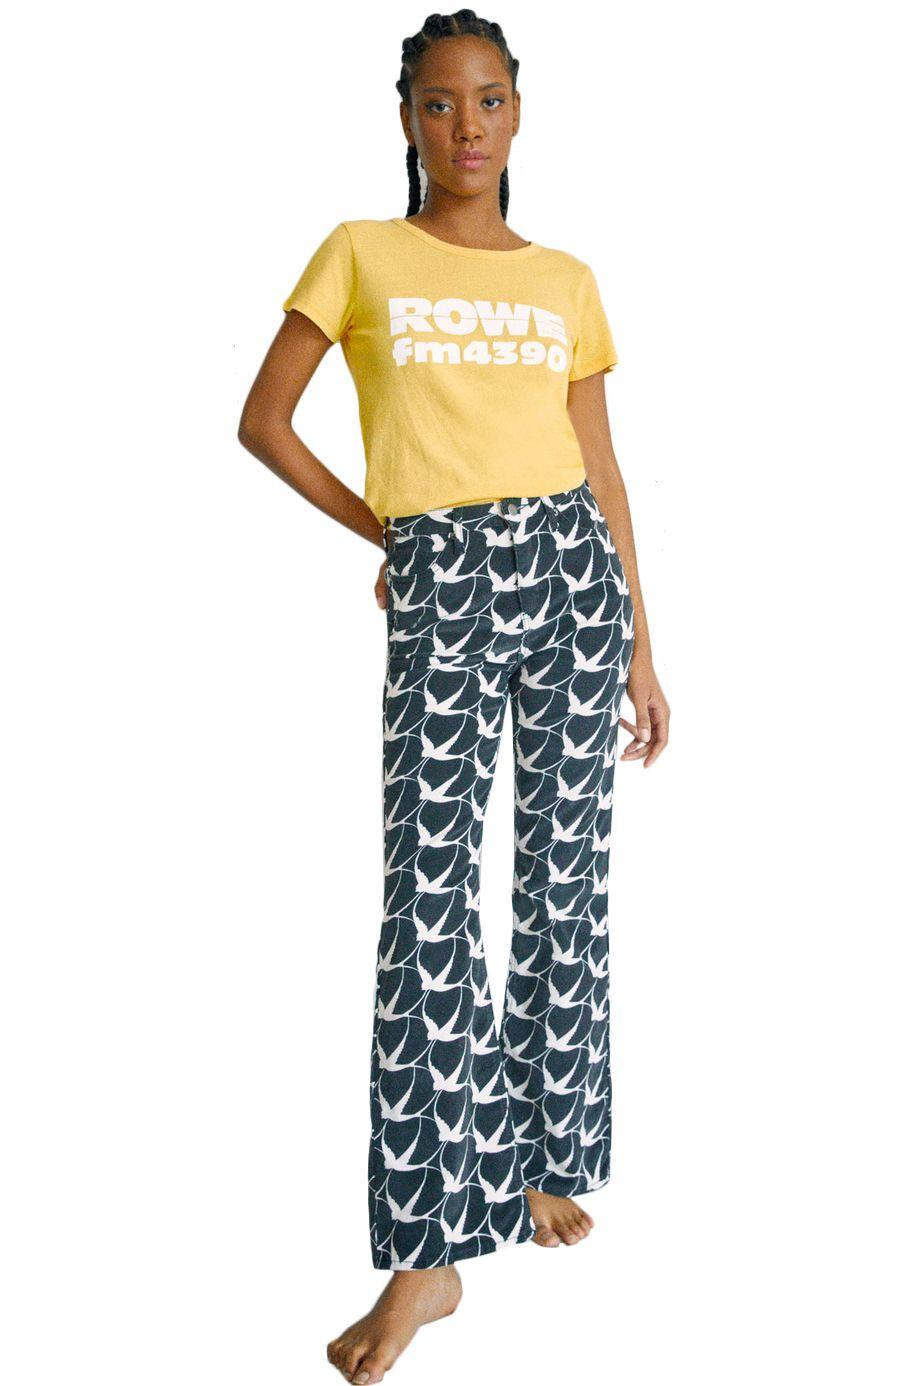 RVCA Pants LIVIN CORDUROY CAMILLE ROWE Black/White